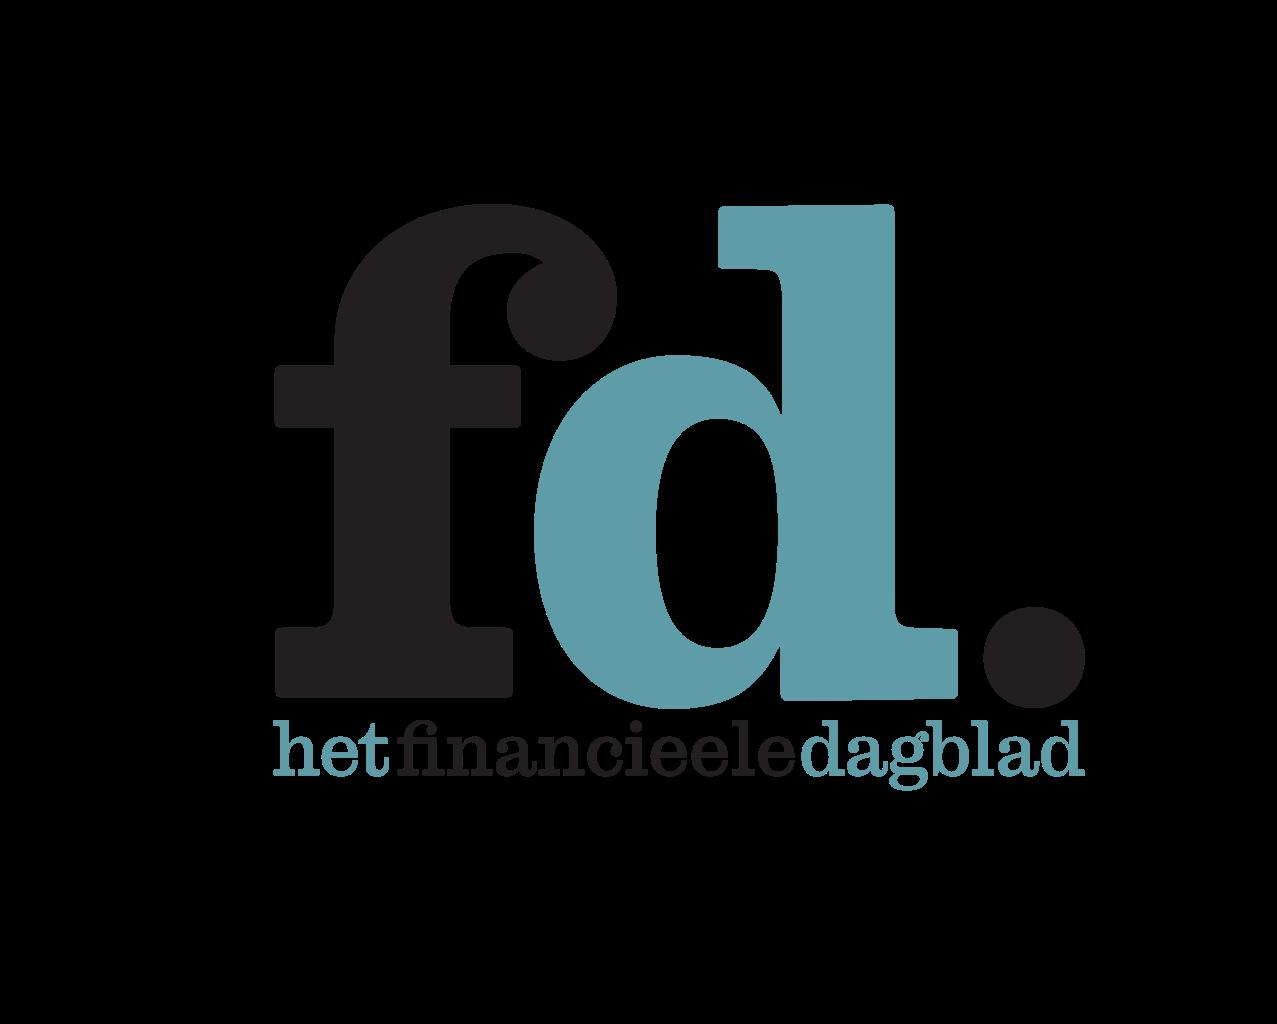 File:Logo Het Financieele Dagblad.svg.